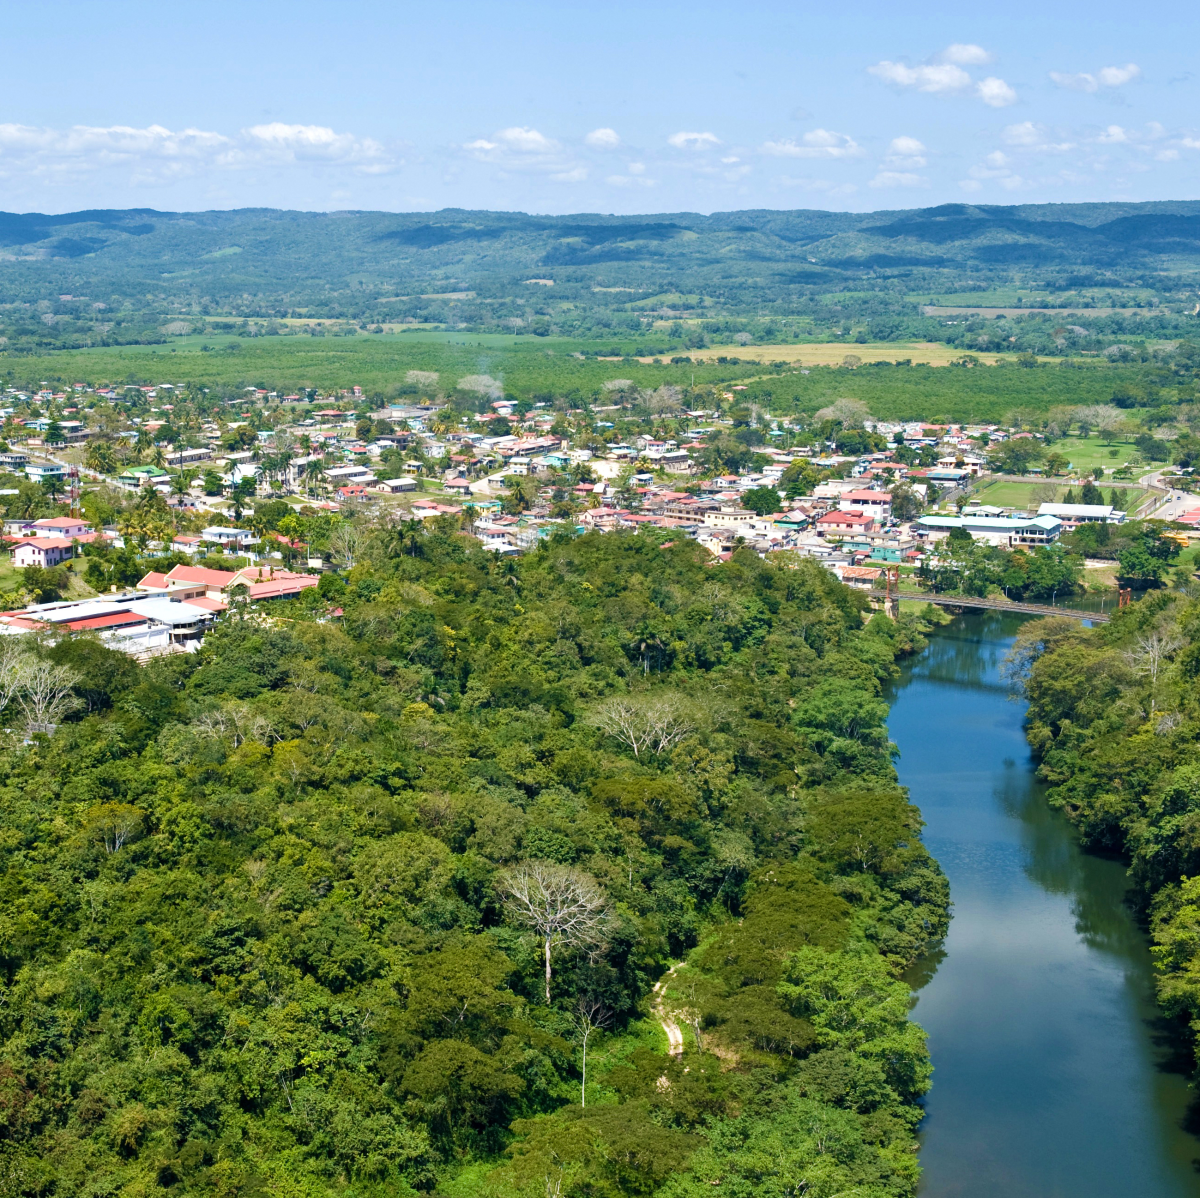 San Ignacio in Belize